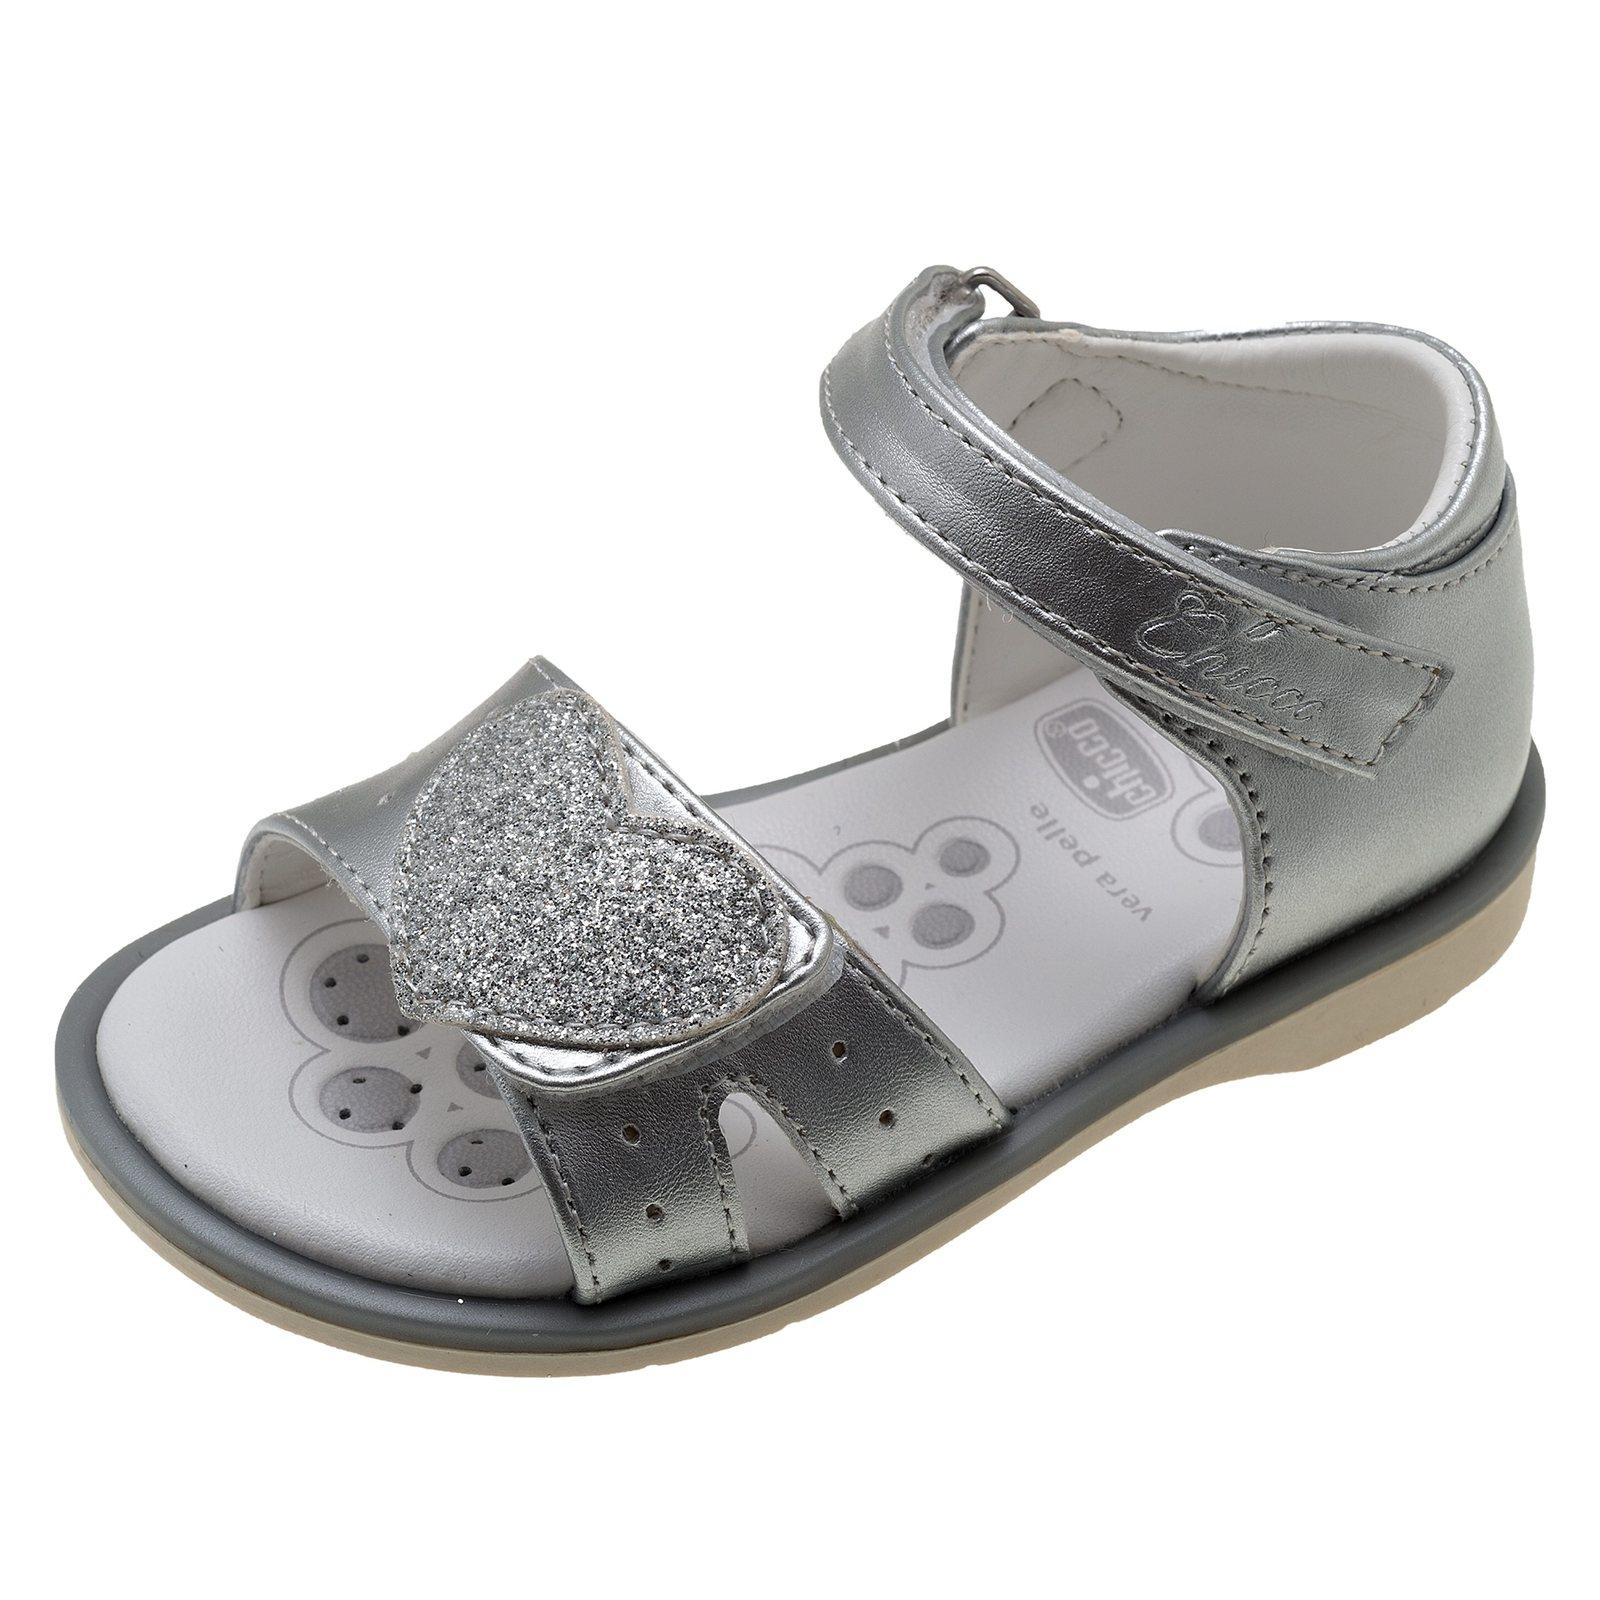 Sandalo Bambina Shop ArgentoAcquista Online Su Caloy Chicco pLqVSUzMG